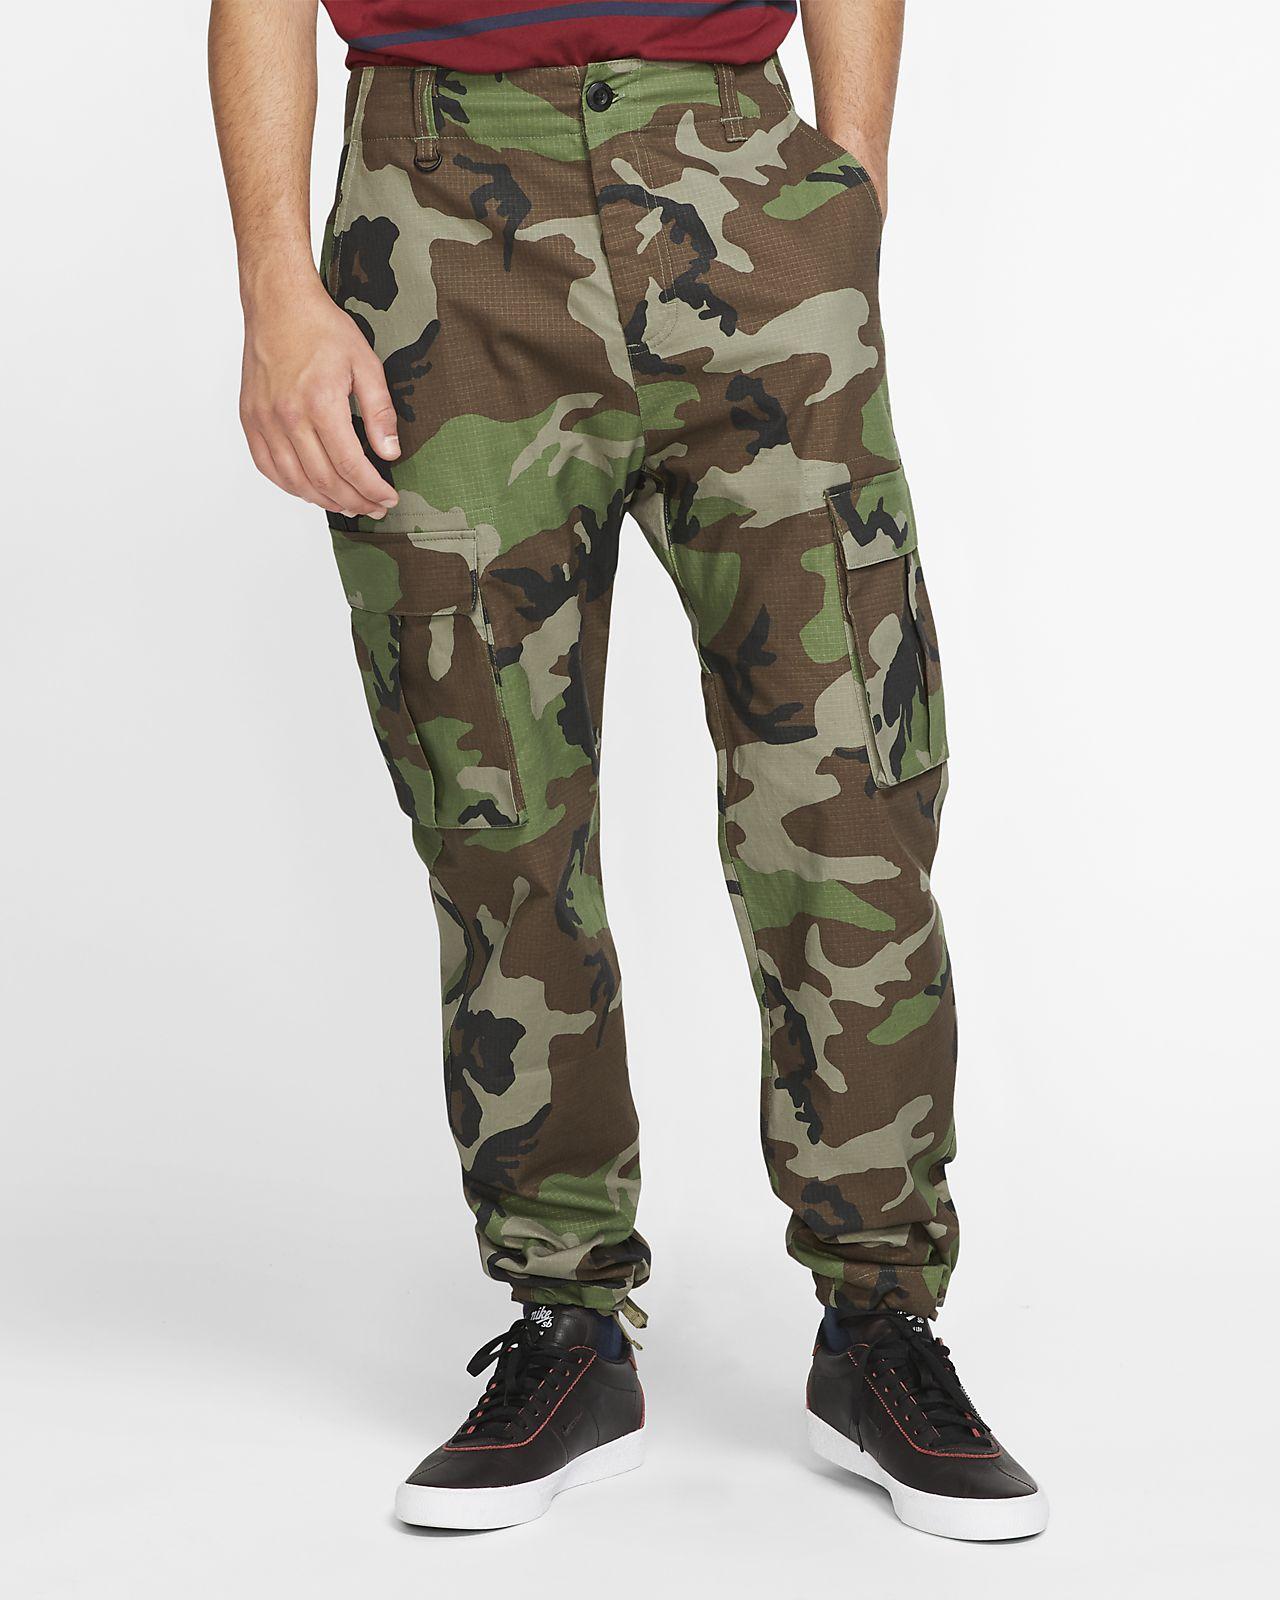 Nike SB Flex FTM Men's Camo Skate Cargo Trousers